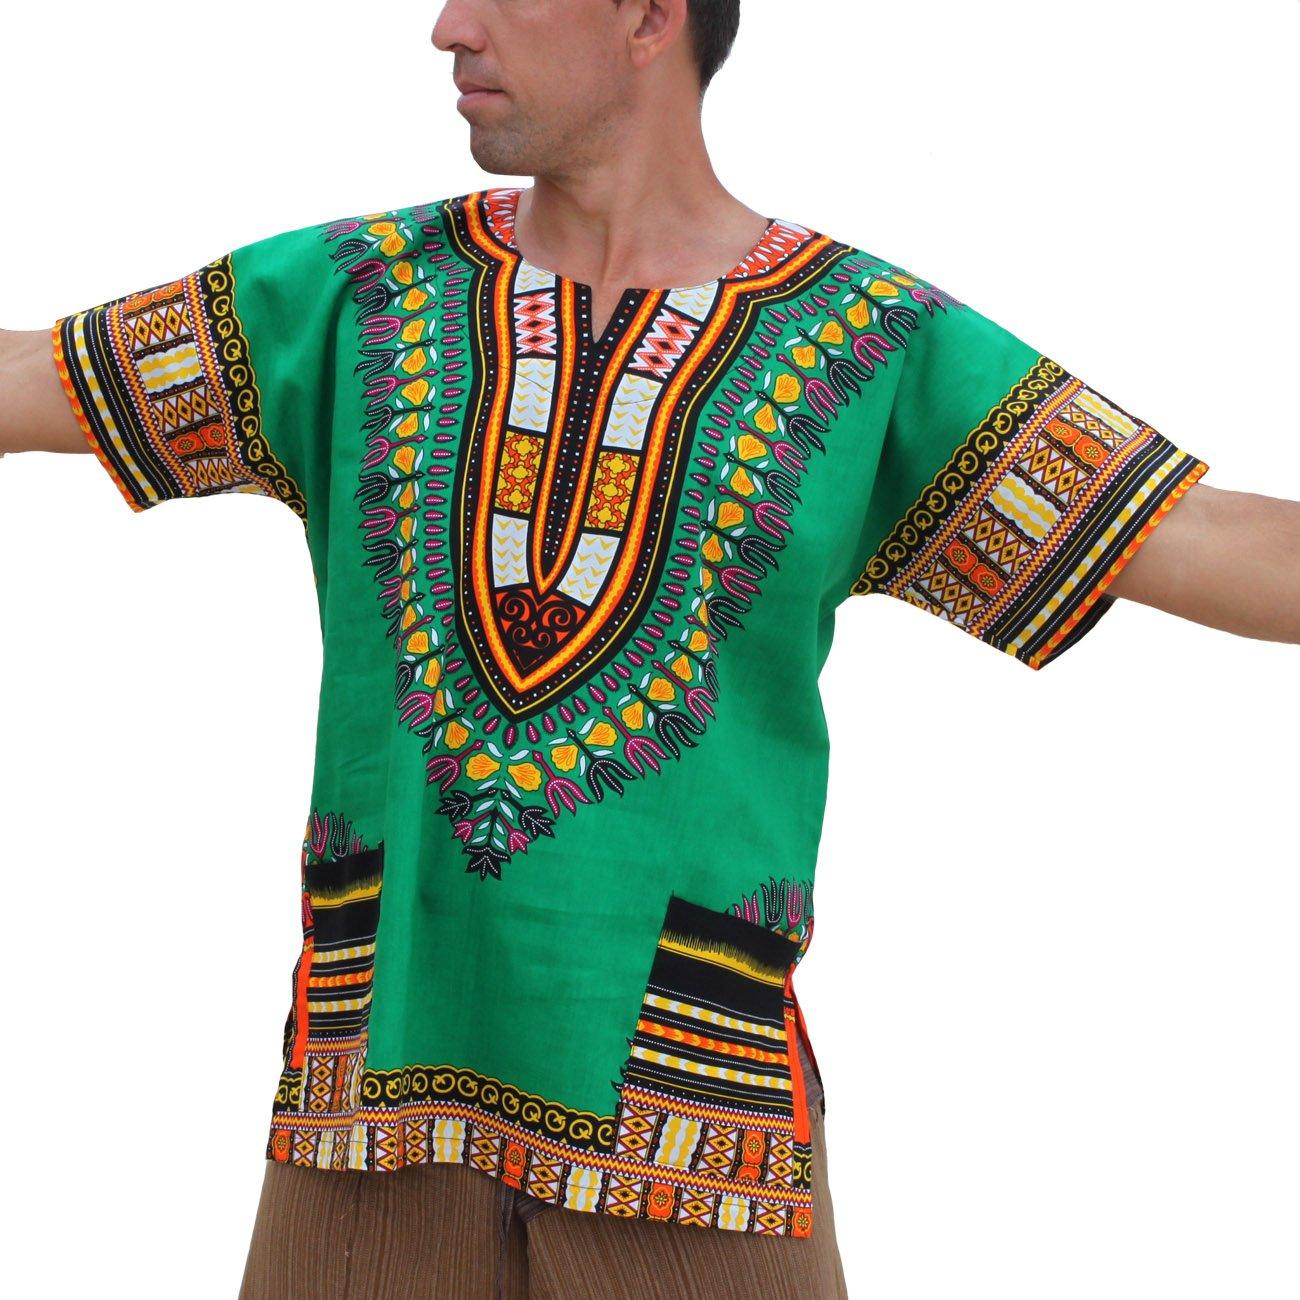 RaanPahMuang Unisex Bright Coloured African Dashiki Cotton Plus Shirt, XXX-Large, Green Mexico by Raan Pah Muang (Image #1)